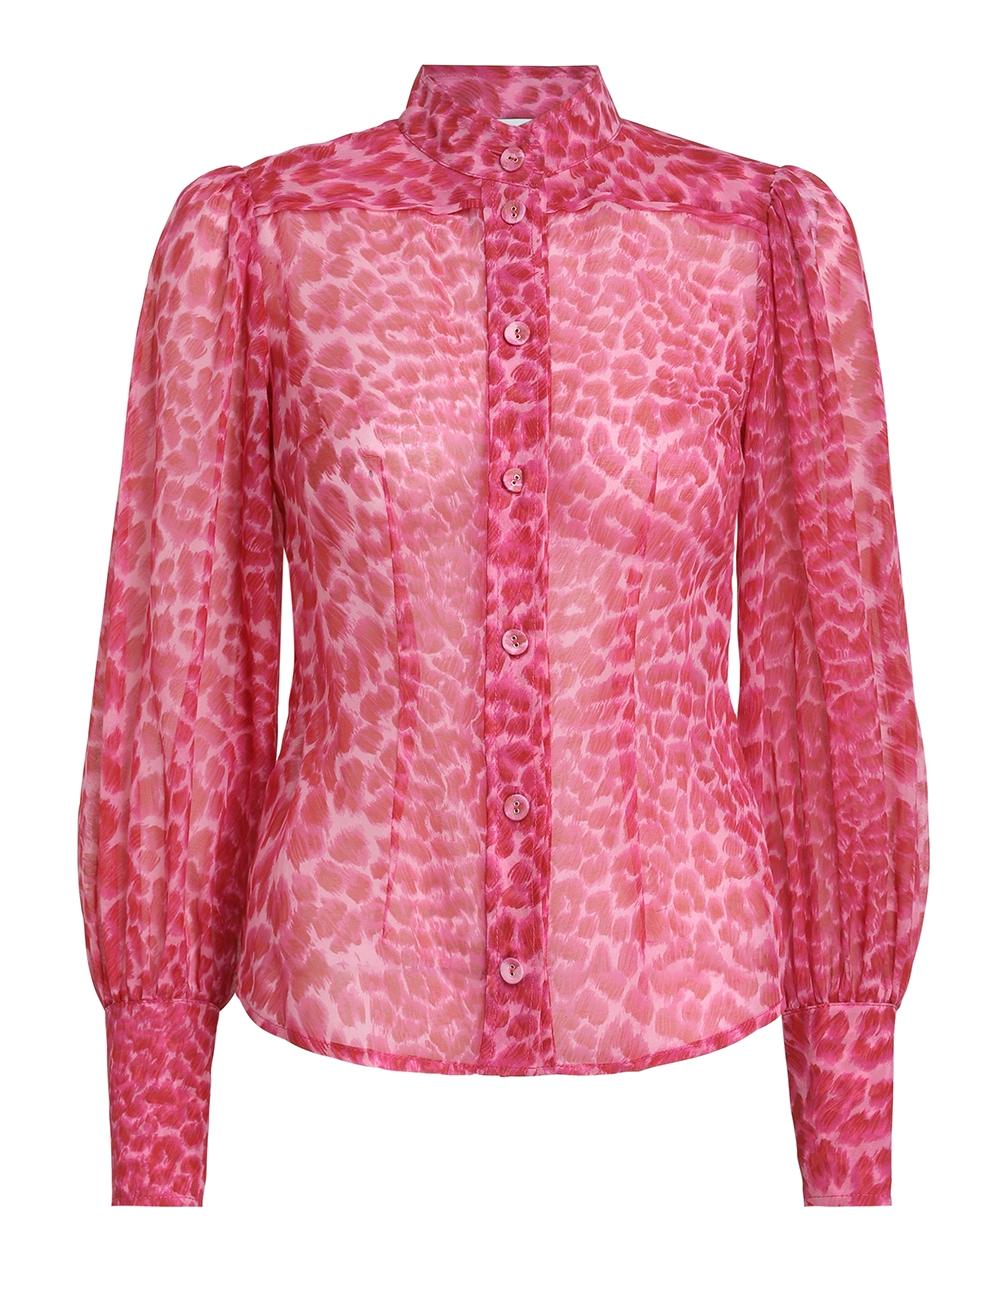 Wavelength Utility Shirt